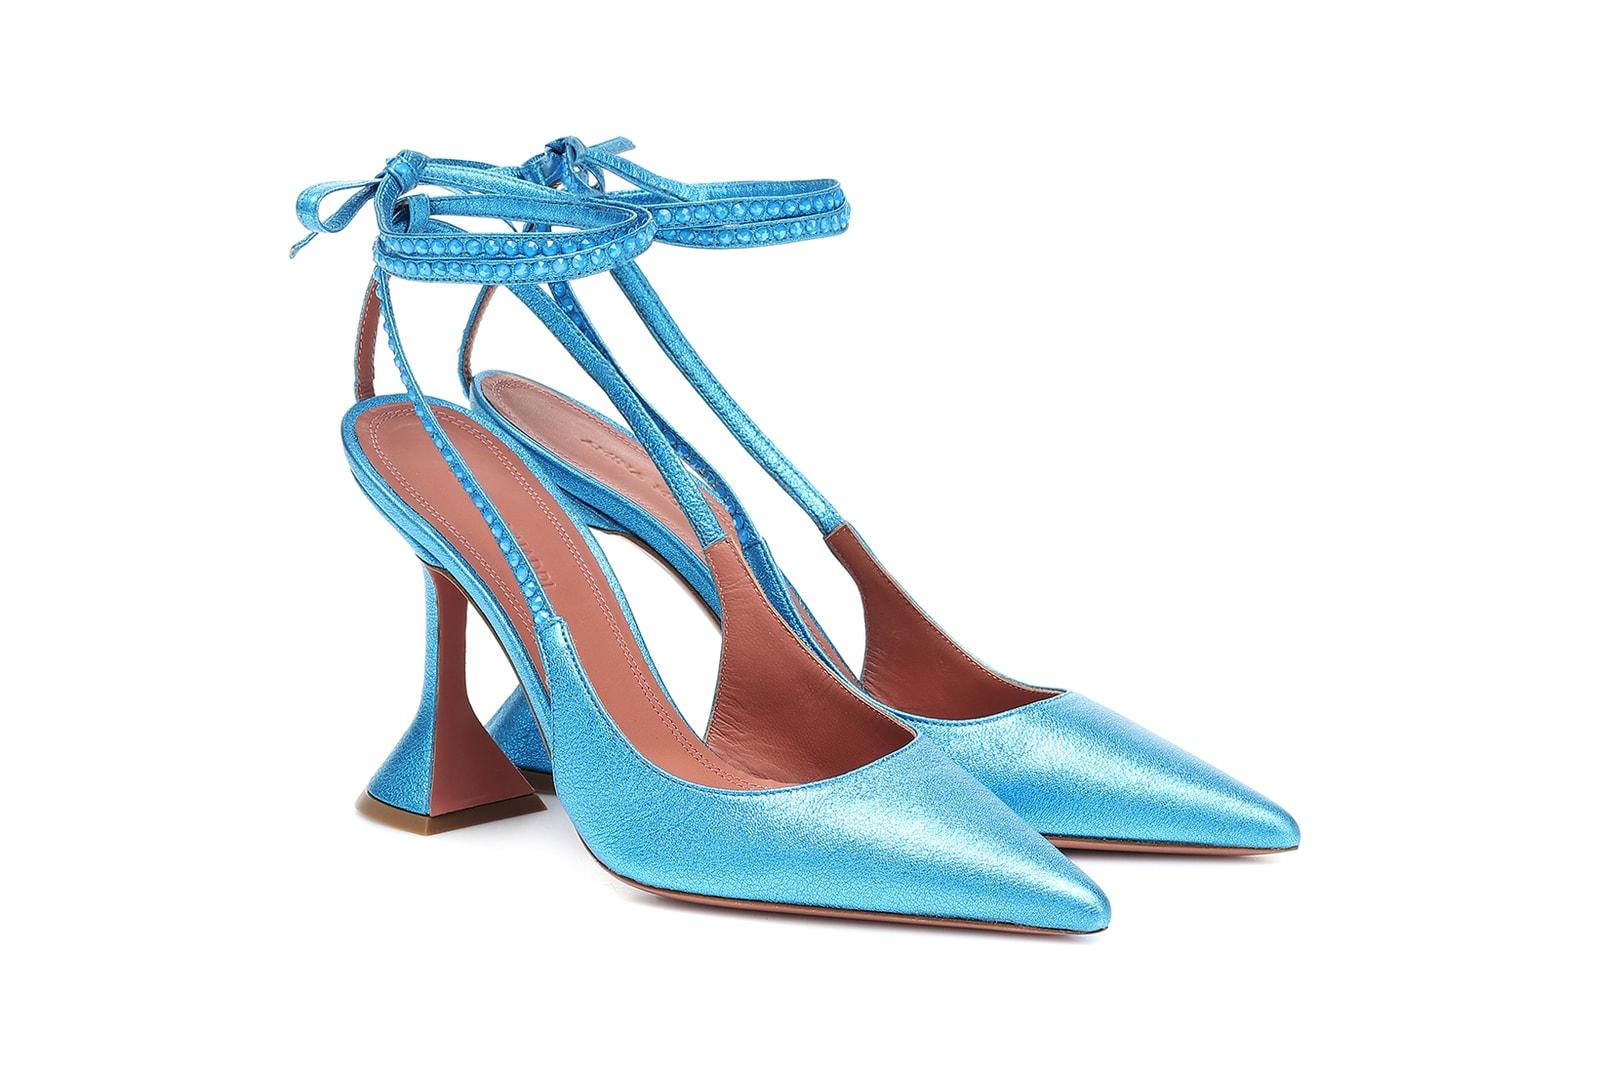 Amina Muaddi x Mytheresa Capsule Collection Heels